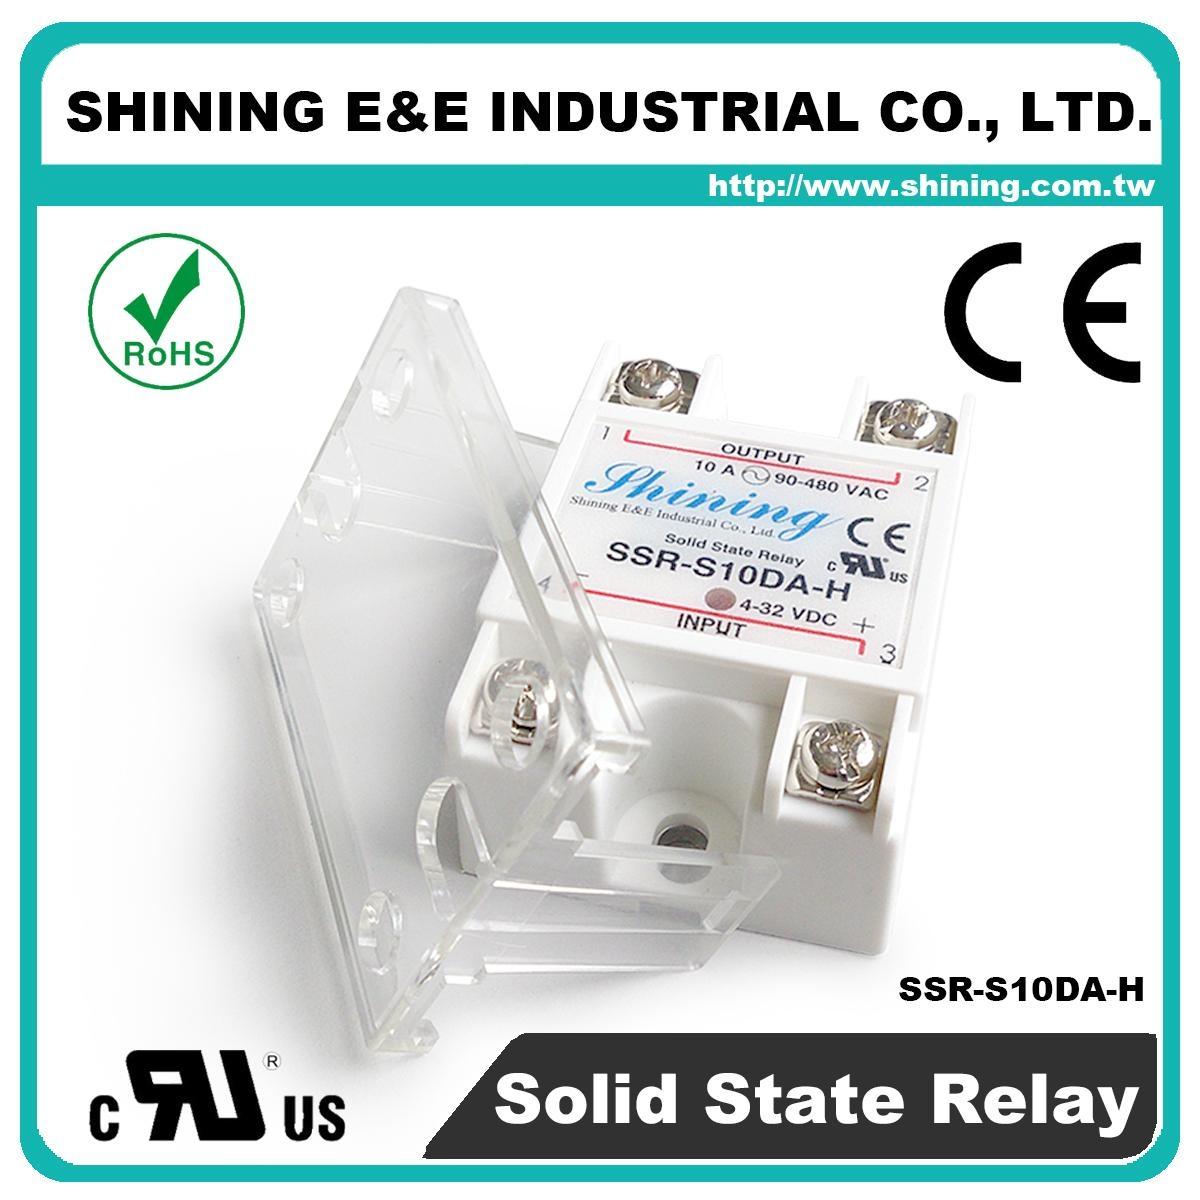 SSR-S10DA-H DC to AC 單相固態繼電器 Solid State Relay 5